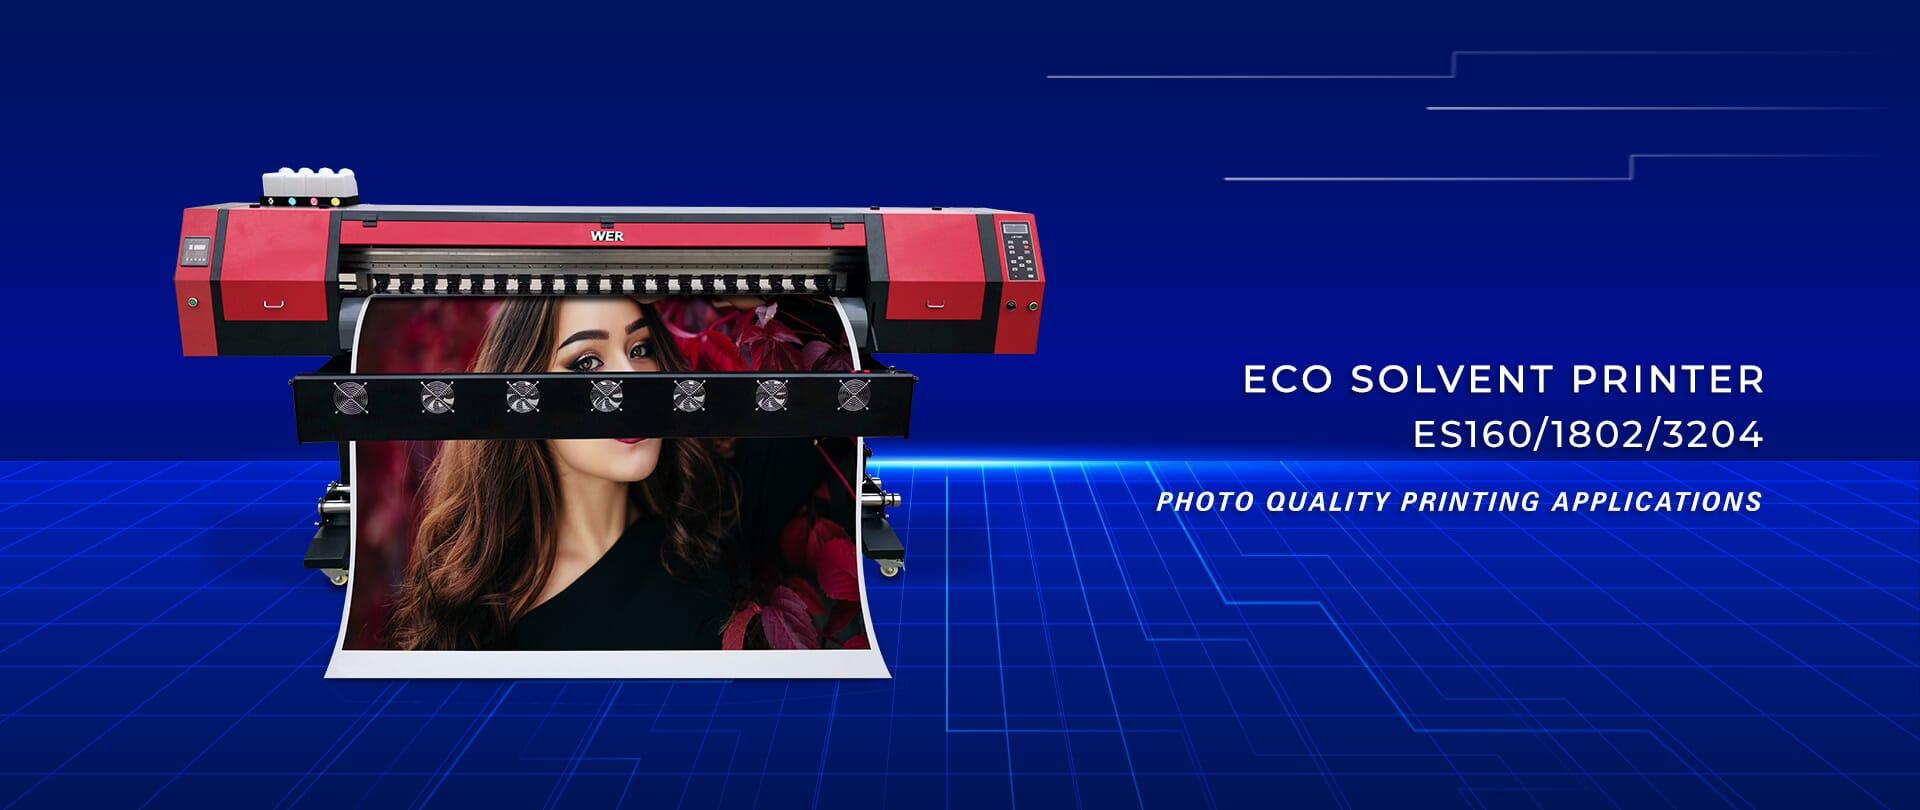 6ft WER-ES1802 Canvas Prints Eco Solvent Printer